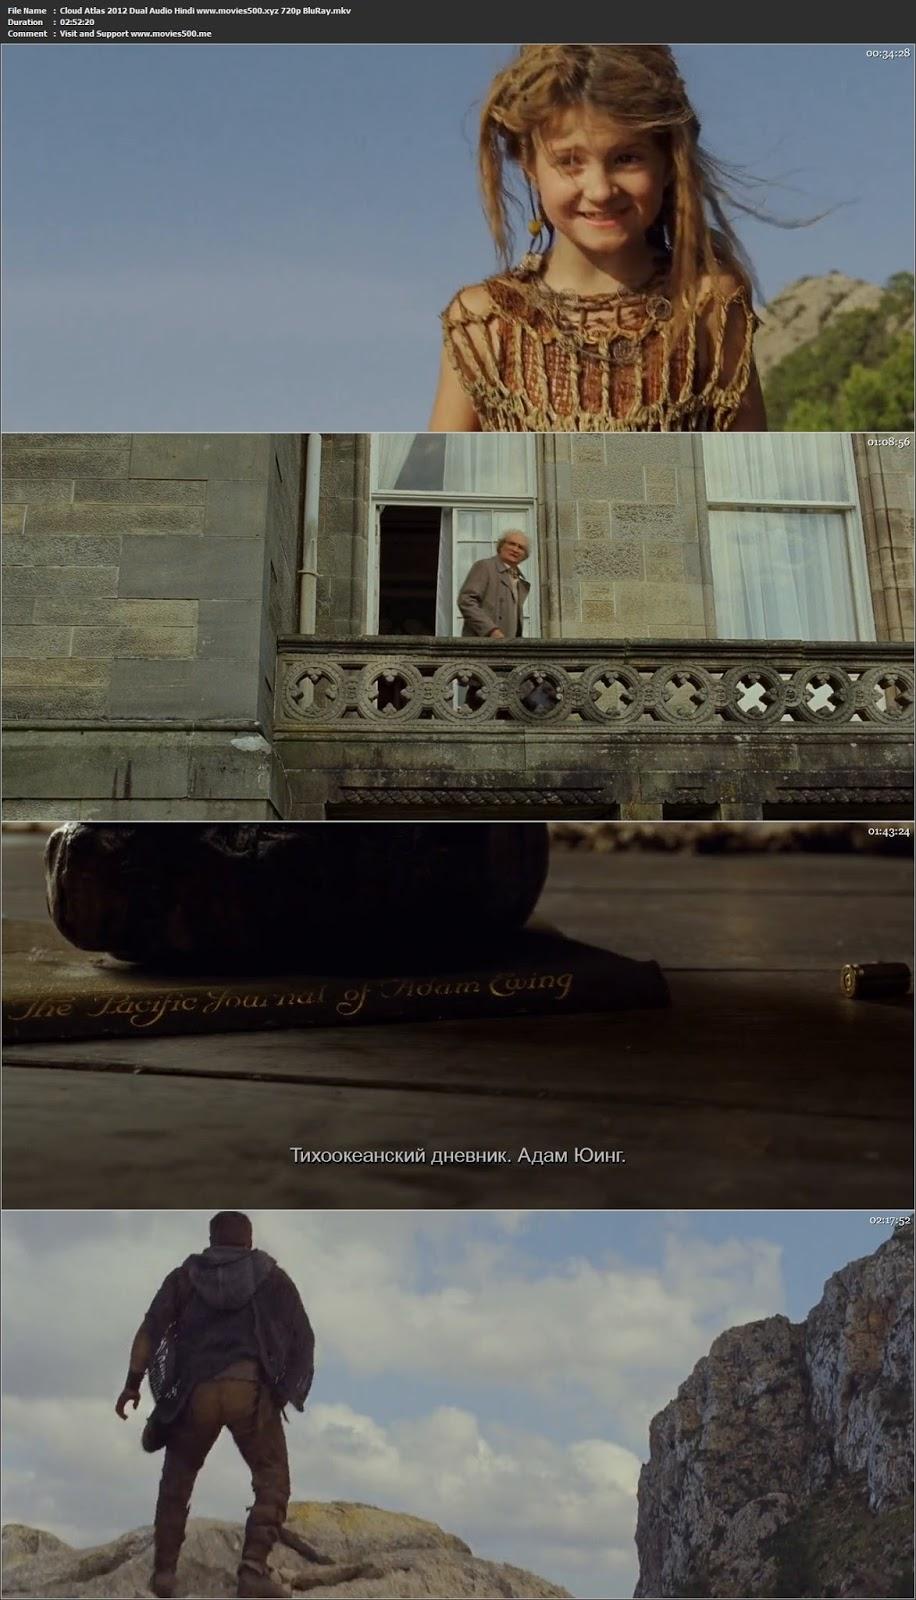 Cloud Atlas 2012 Dual Audio Hindi Full Movie BluRay 720p at movies500.info